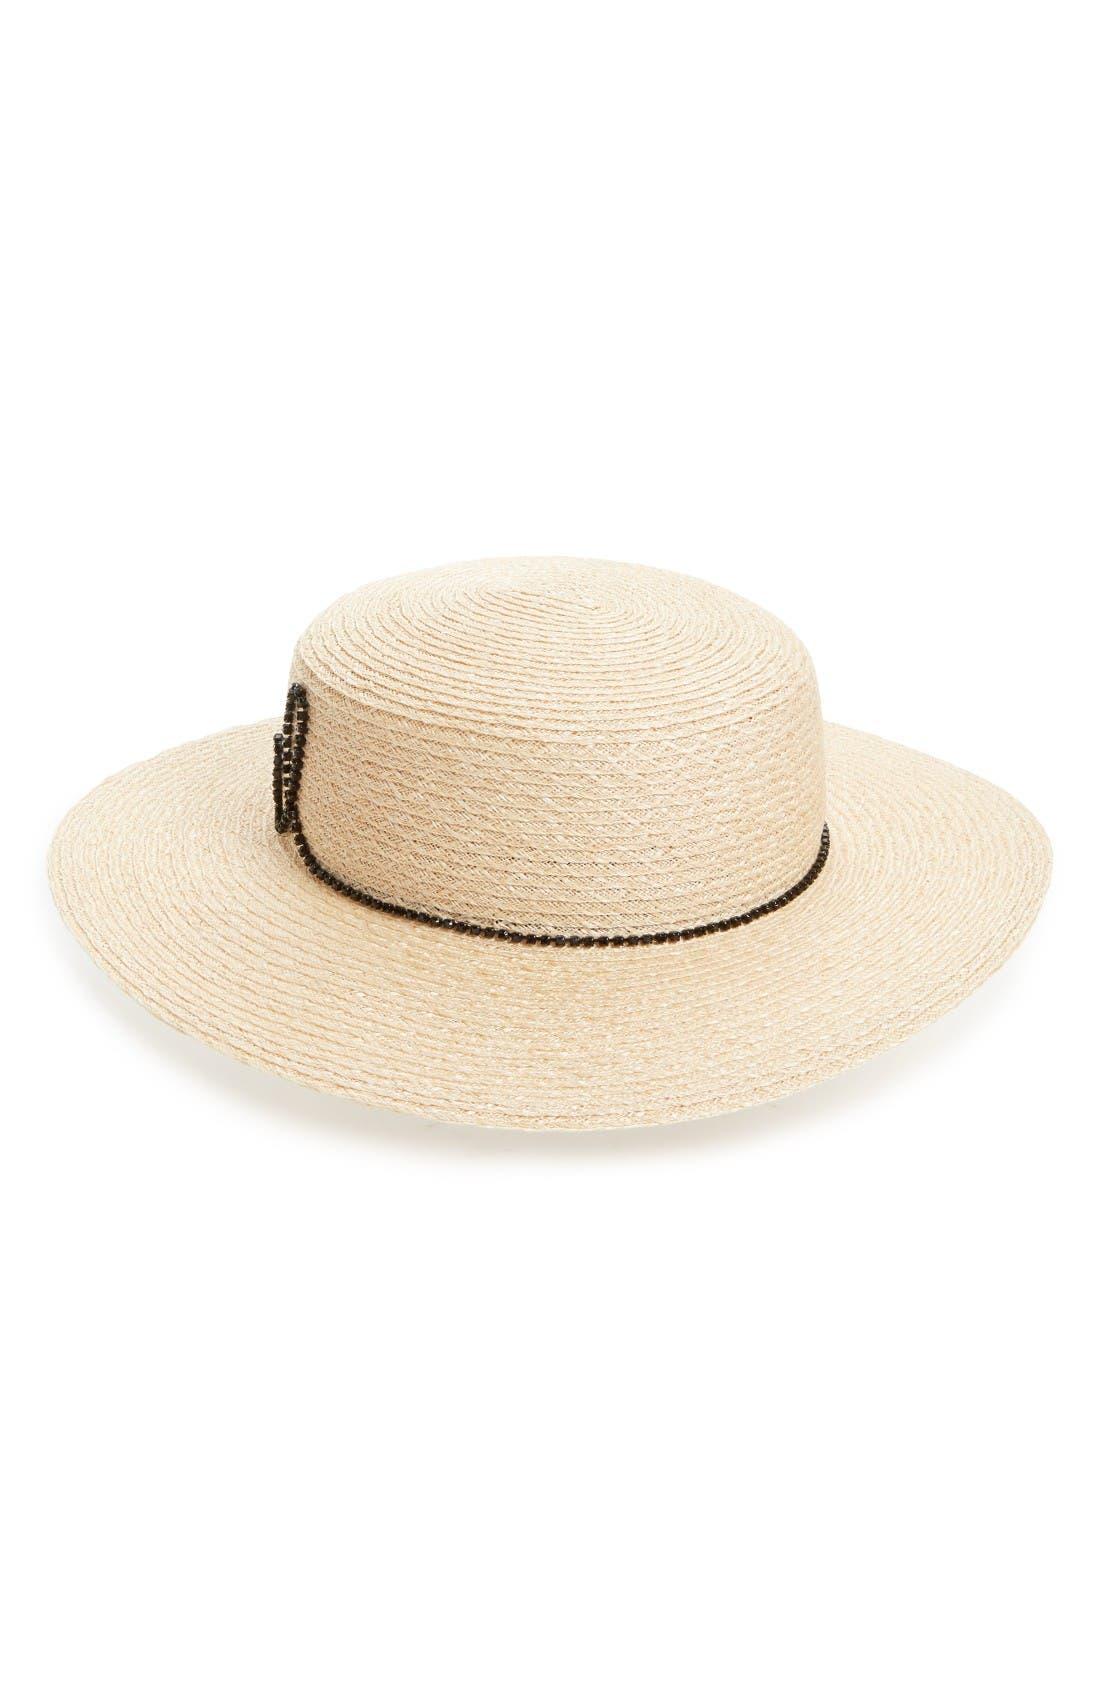 Alternate Image 2  - Eugenia Kim Colette Rebel Boater Hat